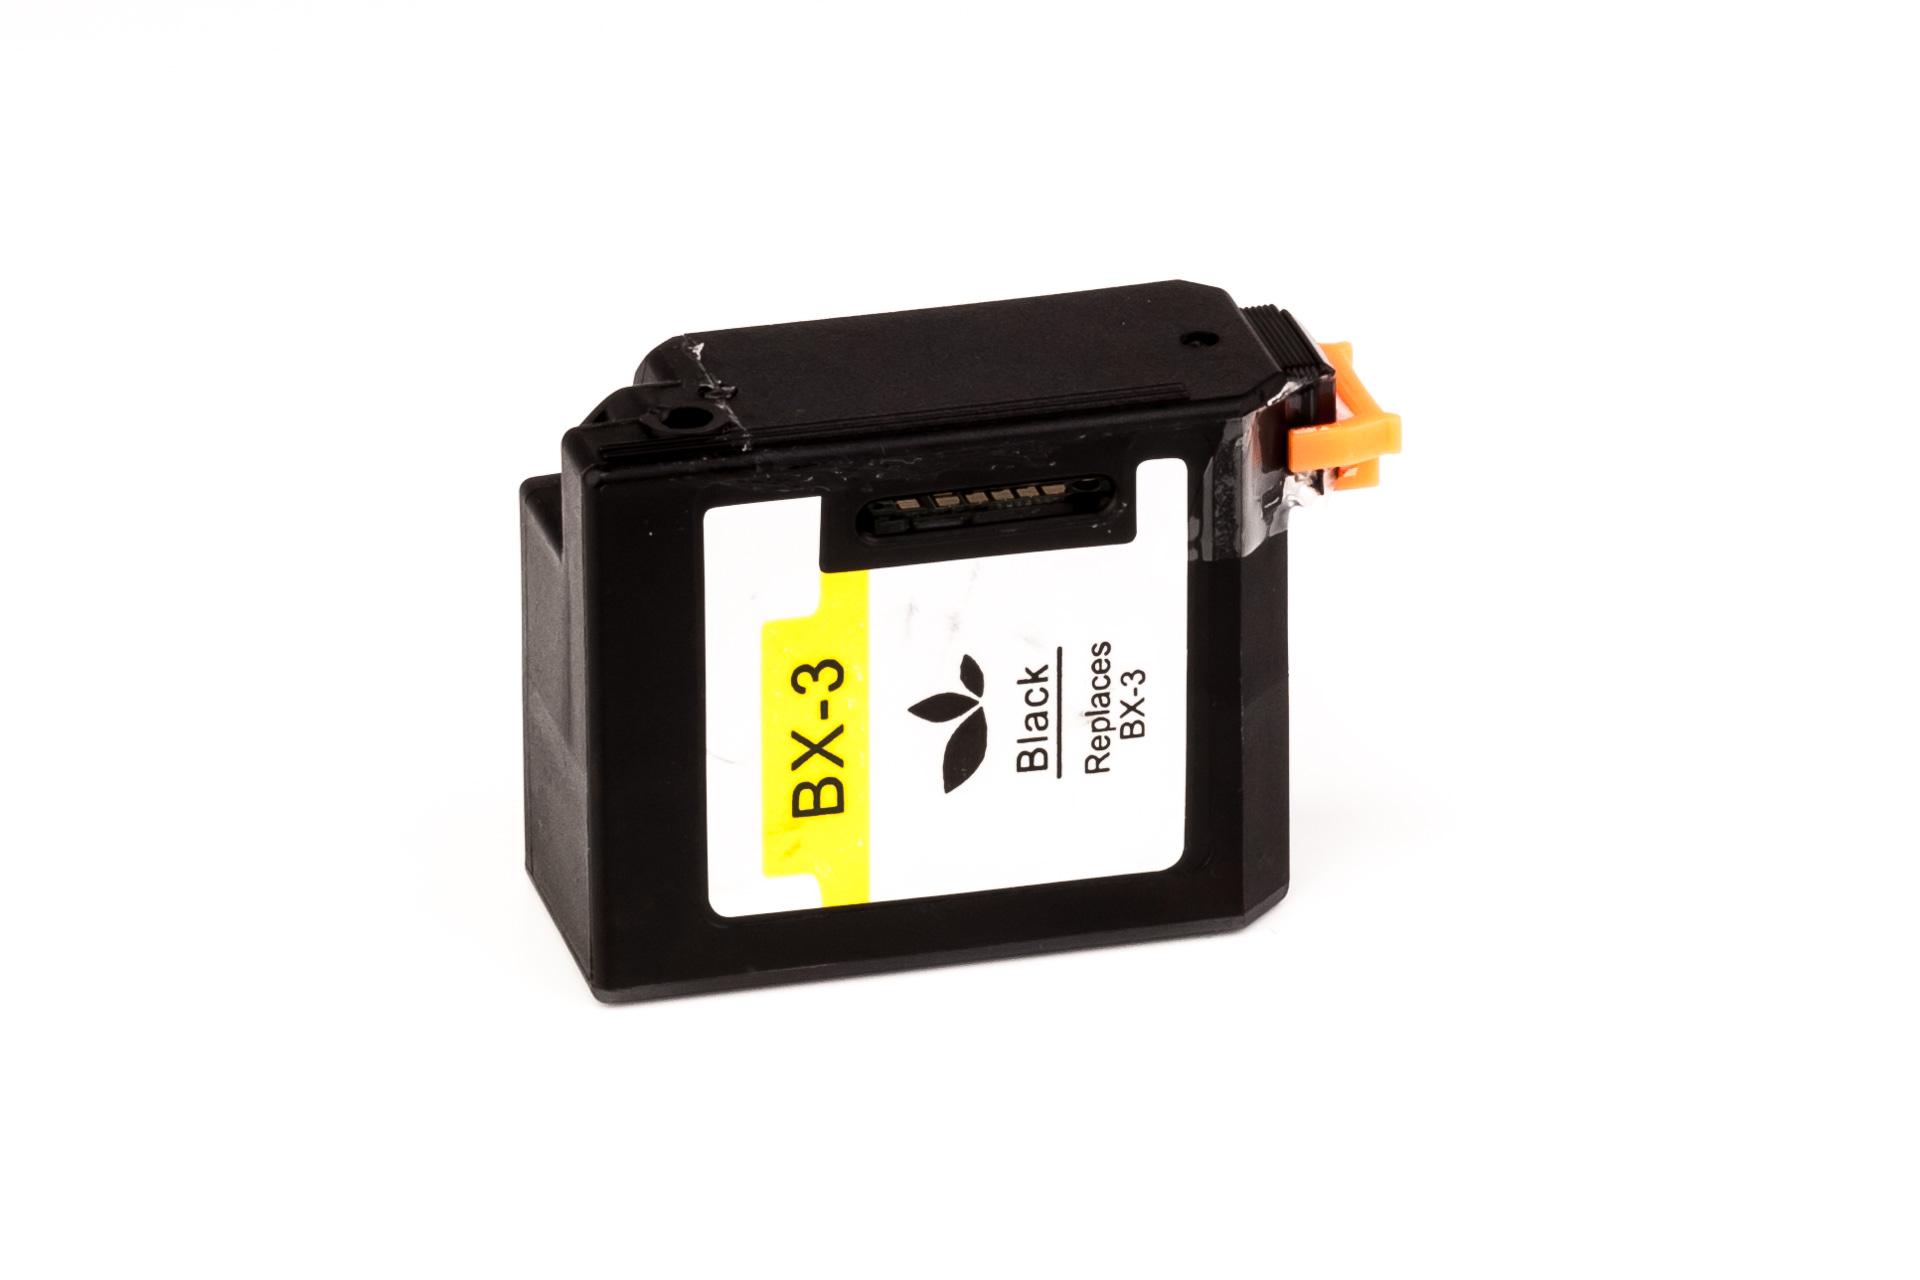 ASC-Premium-Druckkopf für Telekom T-Fax 360 Isdn schwarz T-Fax 360 Isdn T-Fax360Isdn